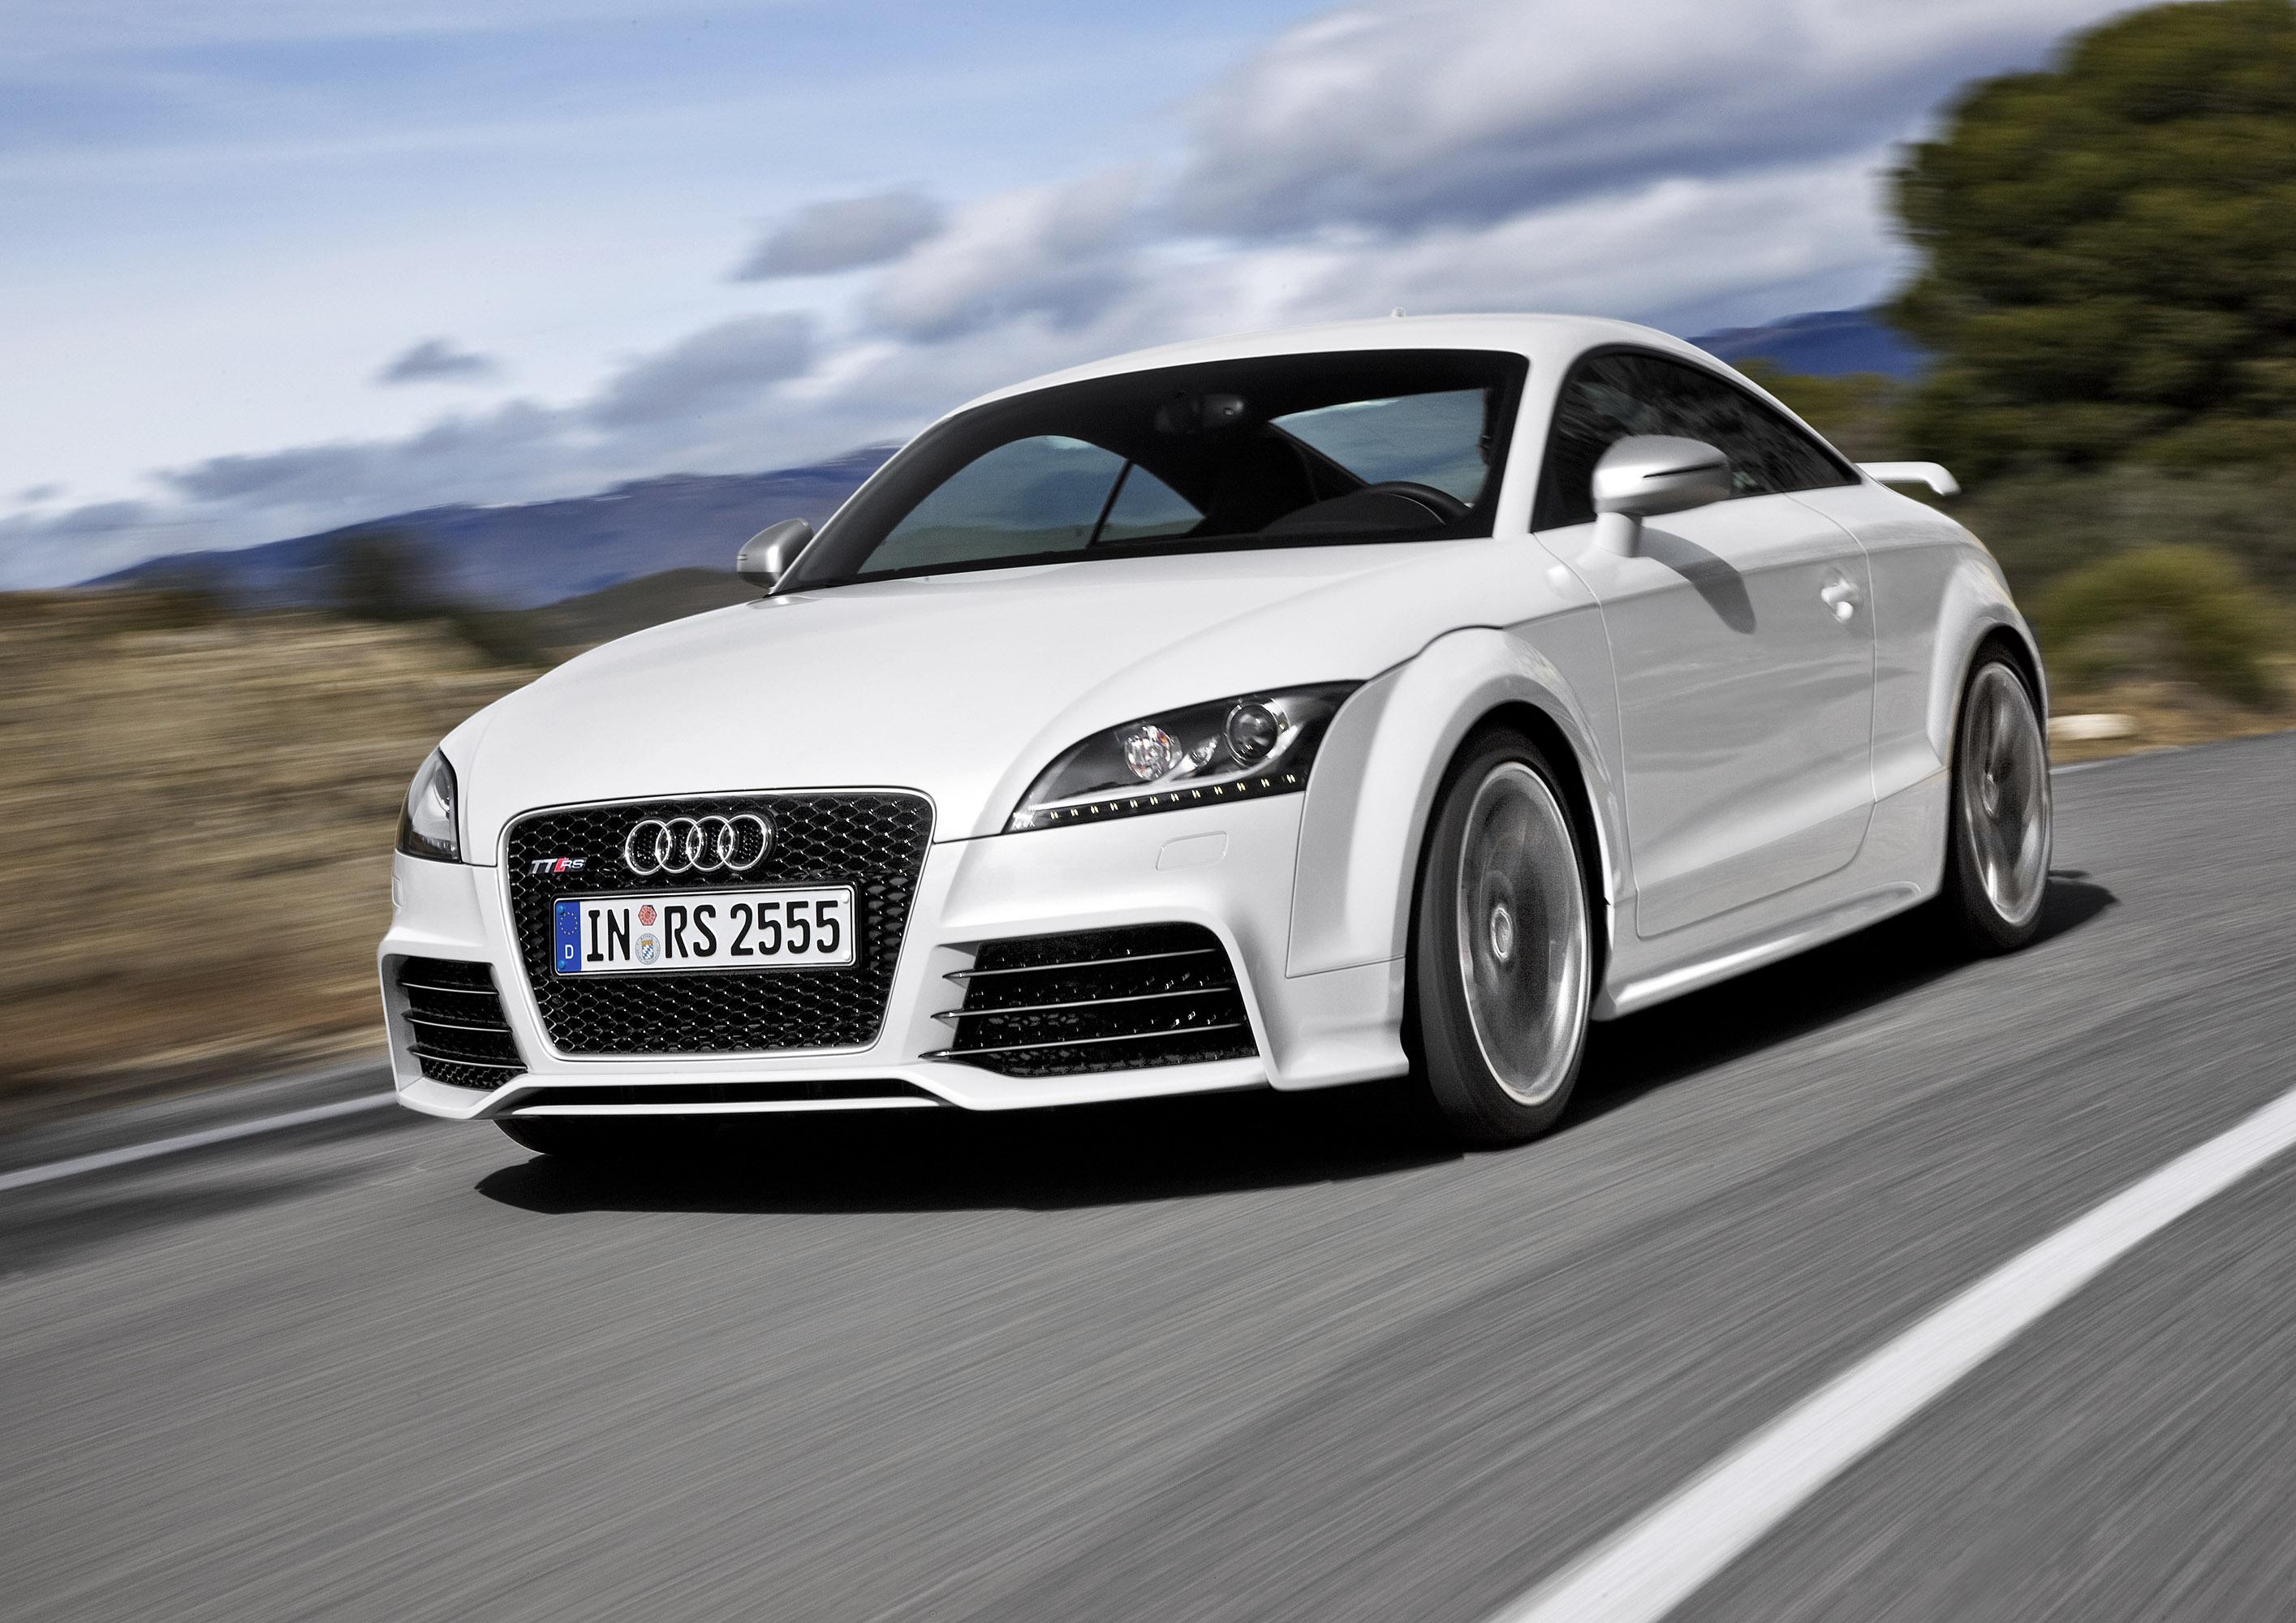 Audi TTRS Price - Auti car